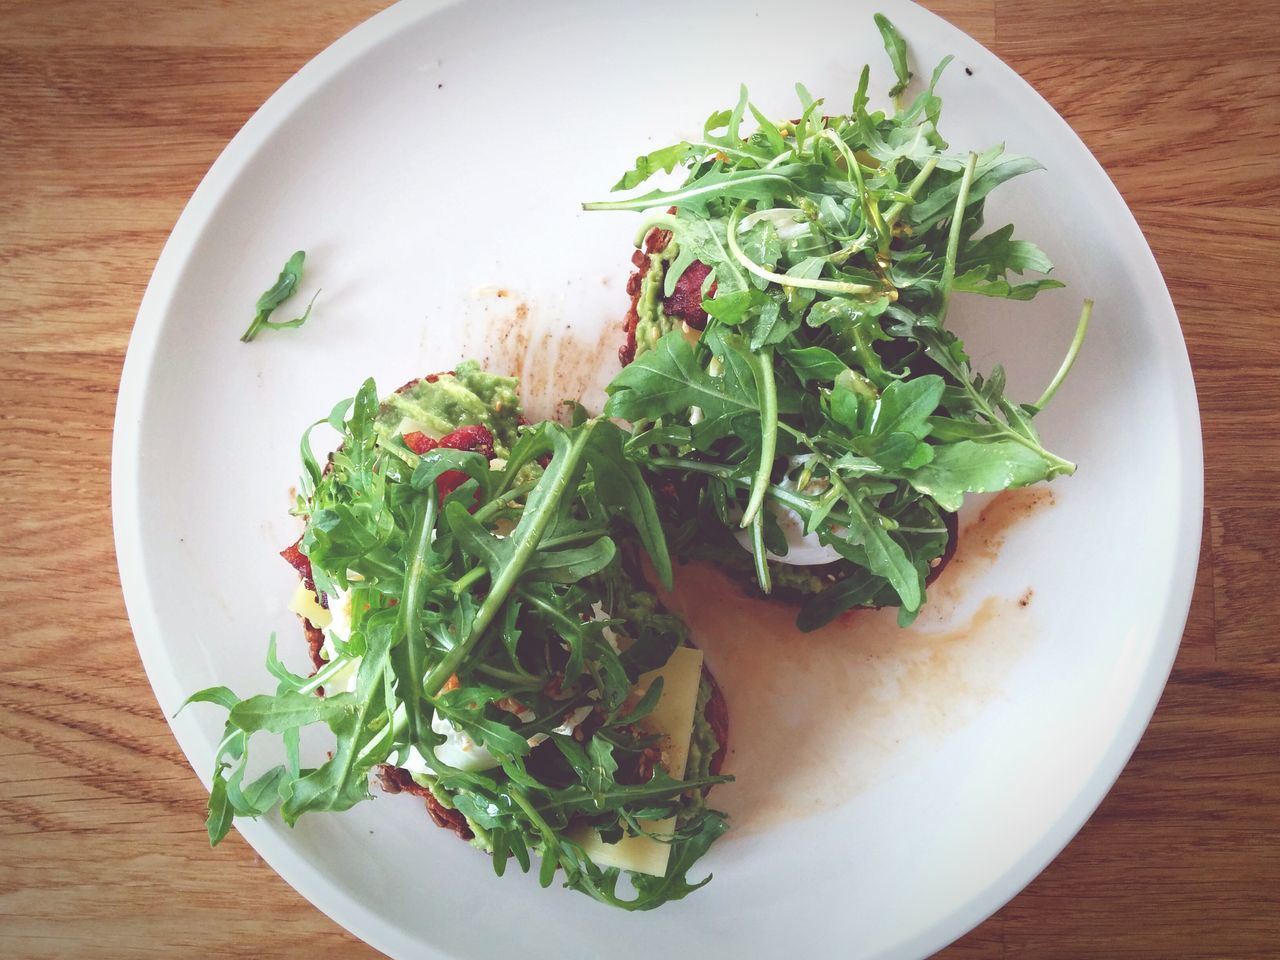 Avocado Smash Breakfast Dukkah Healthy Food Yummy Poached Eggs